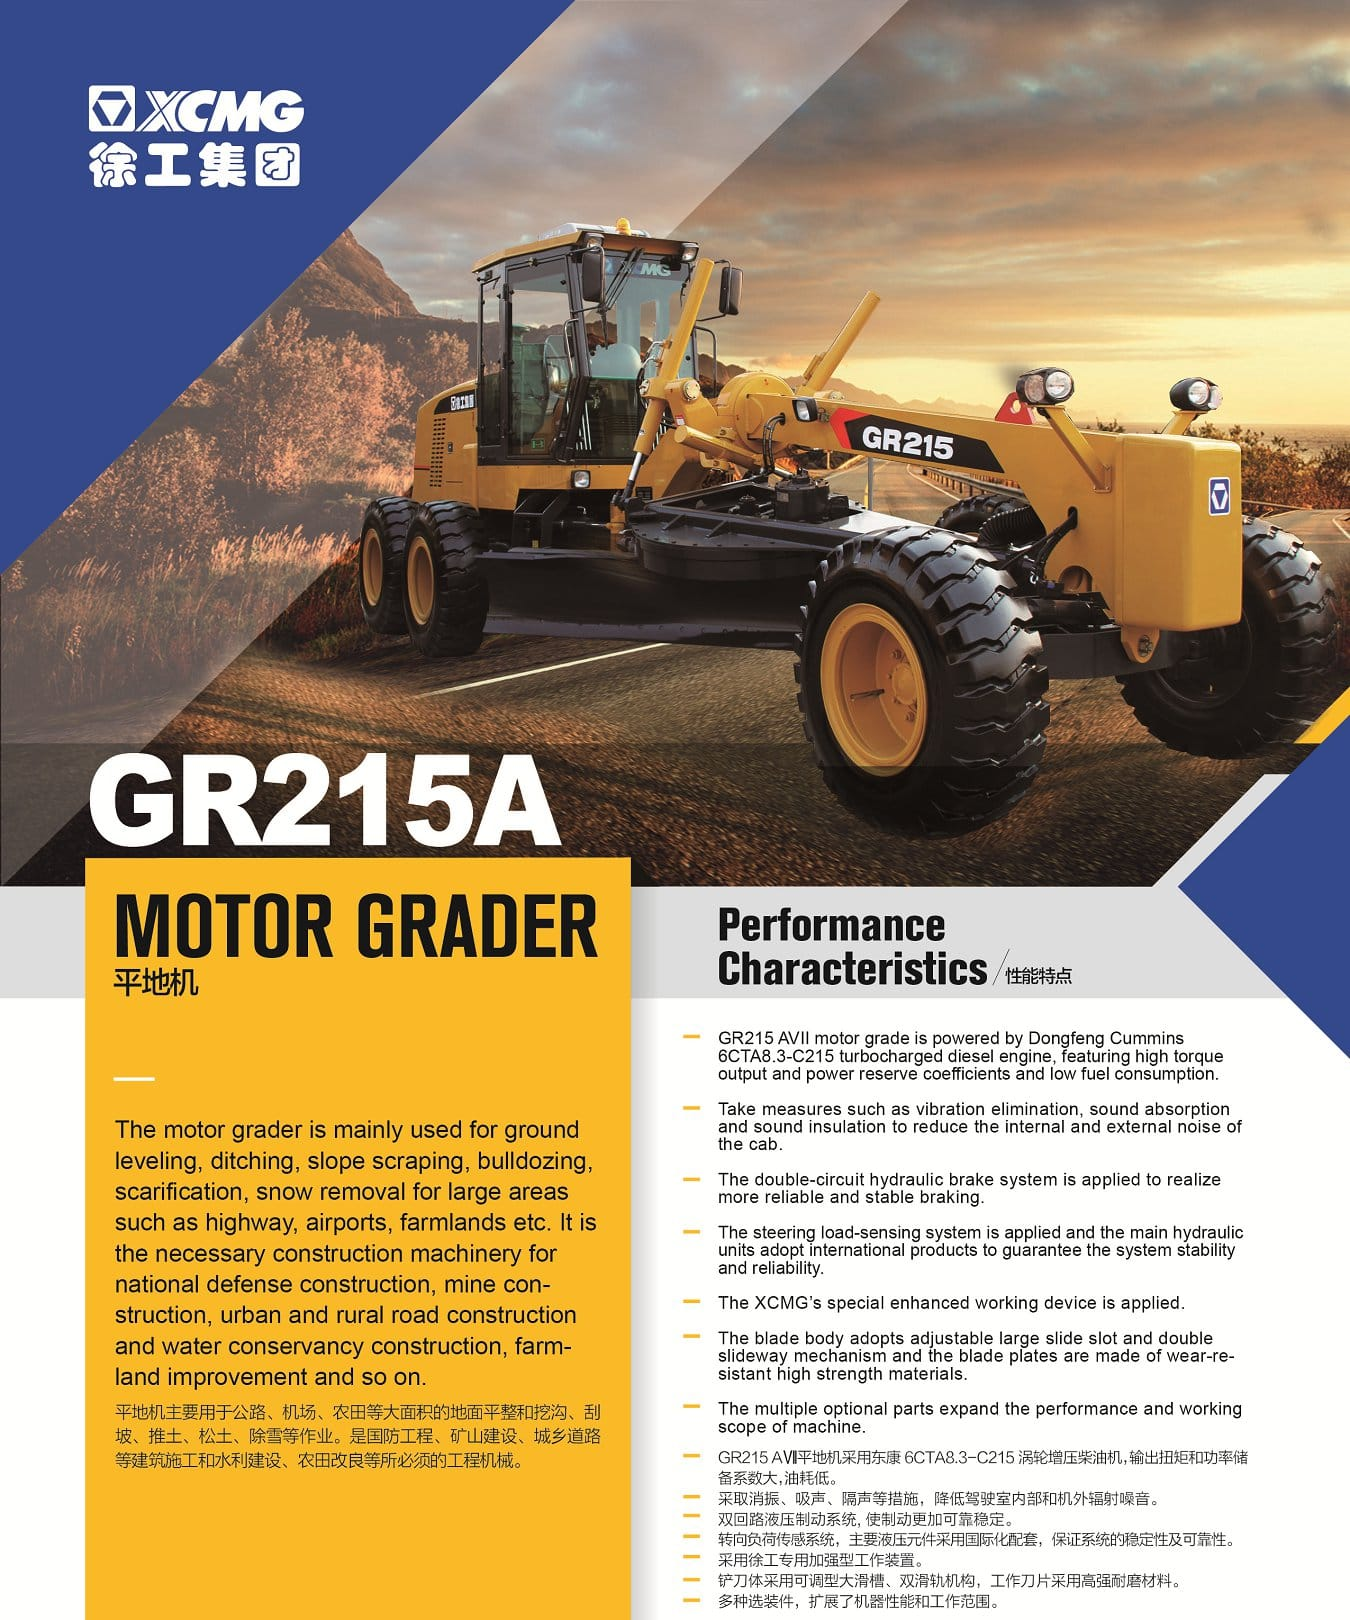 XCMG Official GR215A Motor Grader for sale